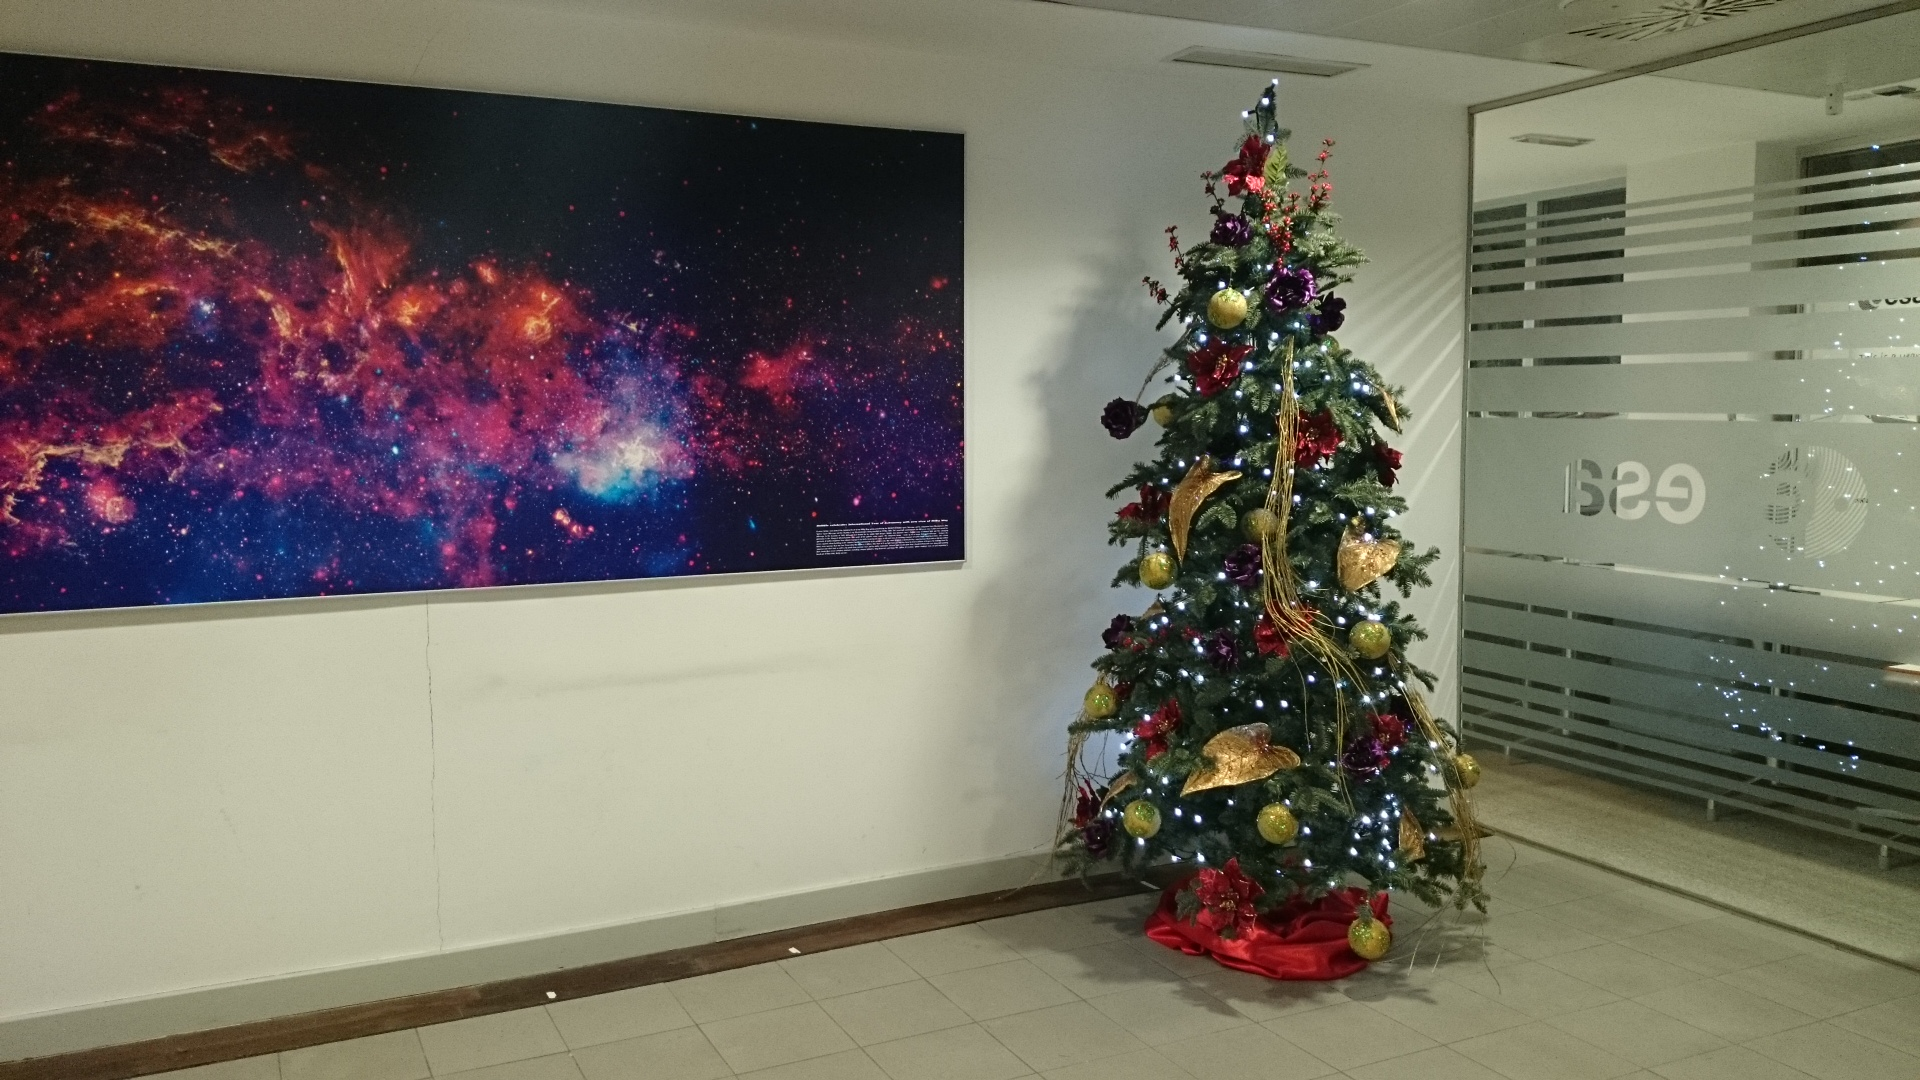 M s de 20 ideas de rboles navide os para tu oficina 11 como organizar la casa fachadas - Decoracion navidena oficinas ...